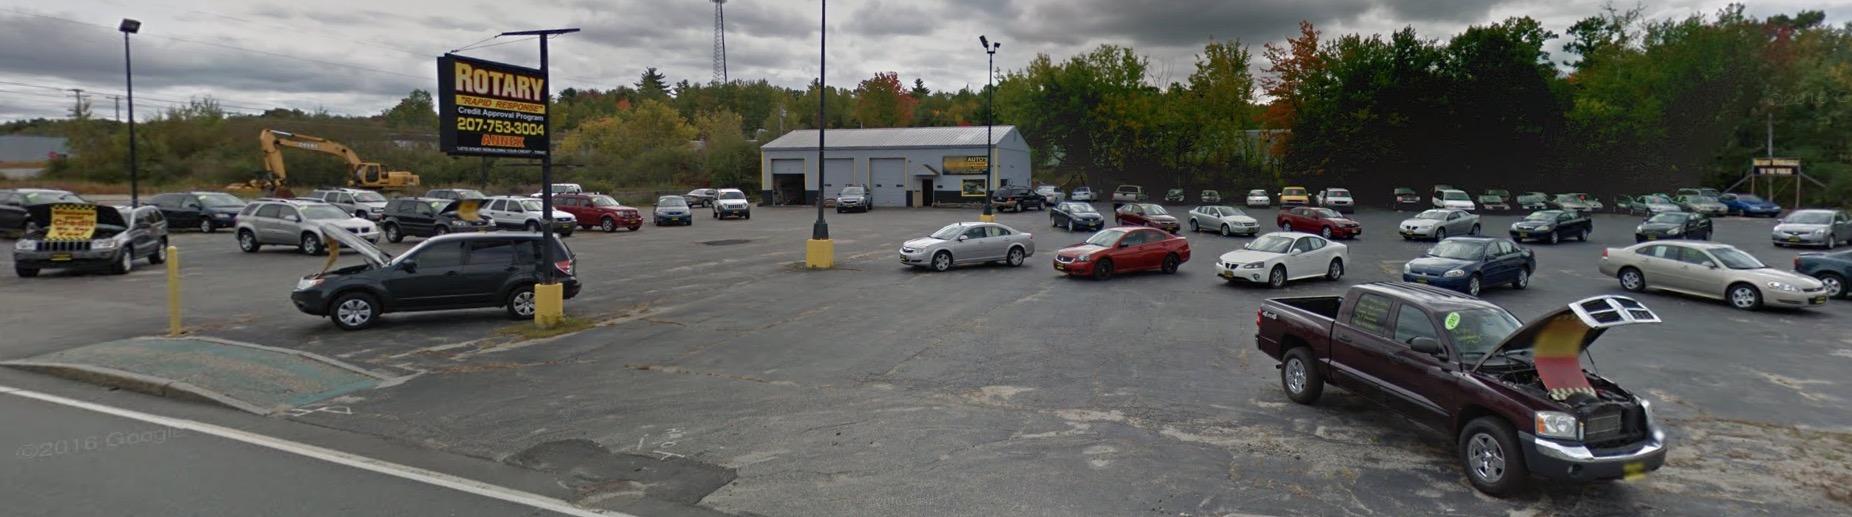 rotary auto sales maine